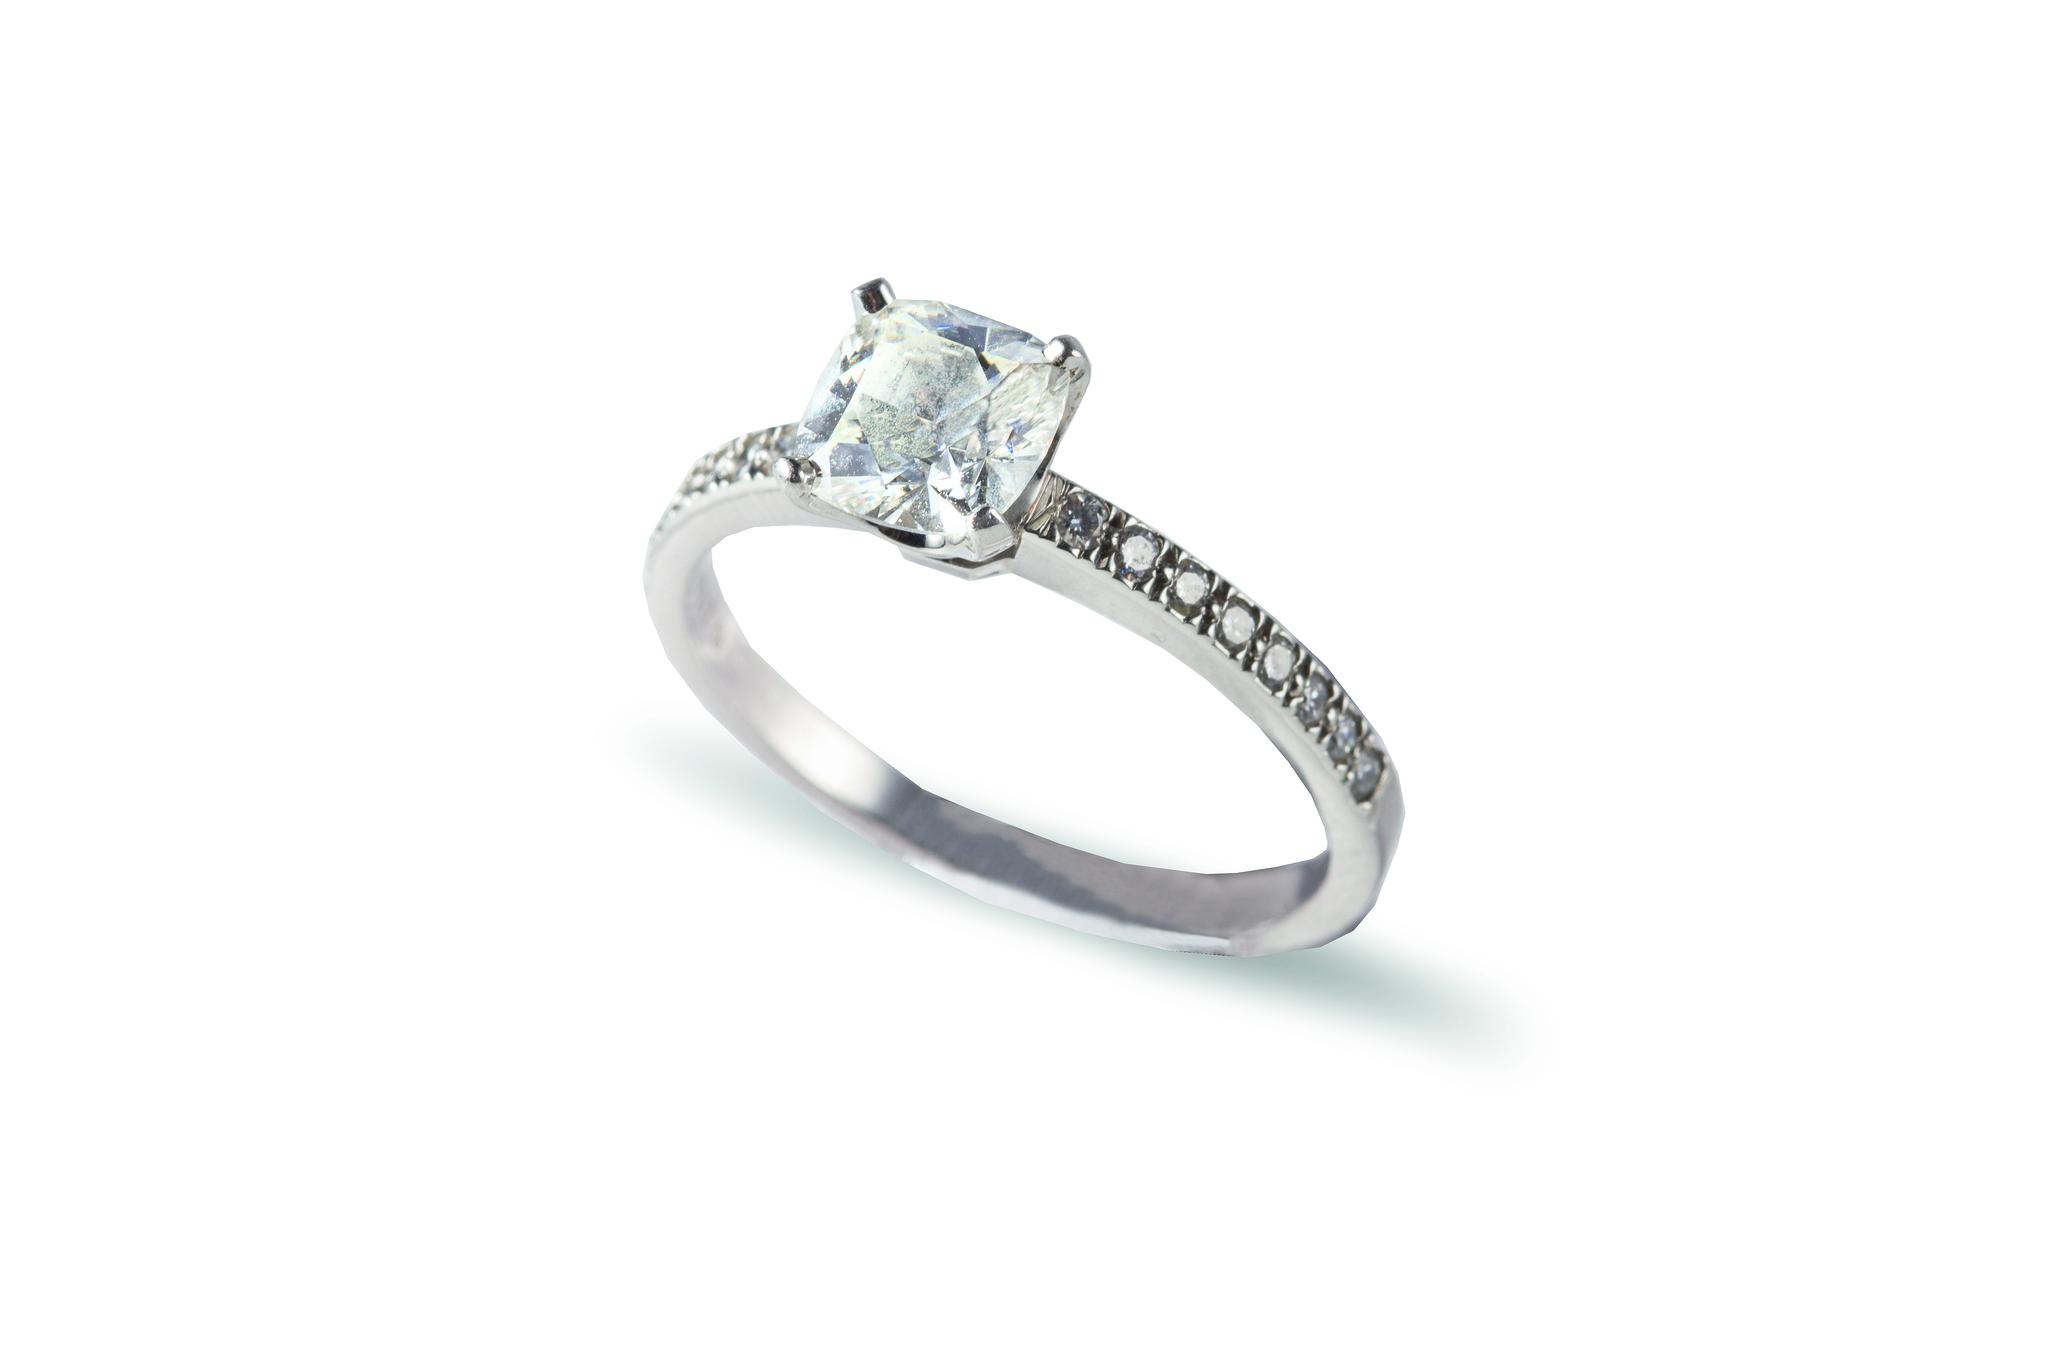 bague diamant 4000 euros